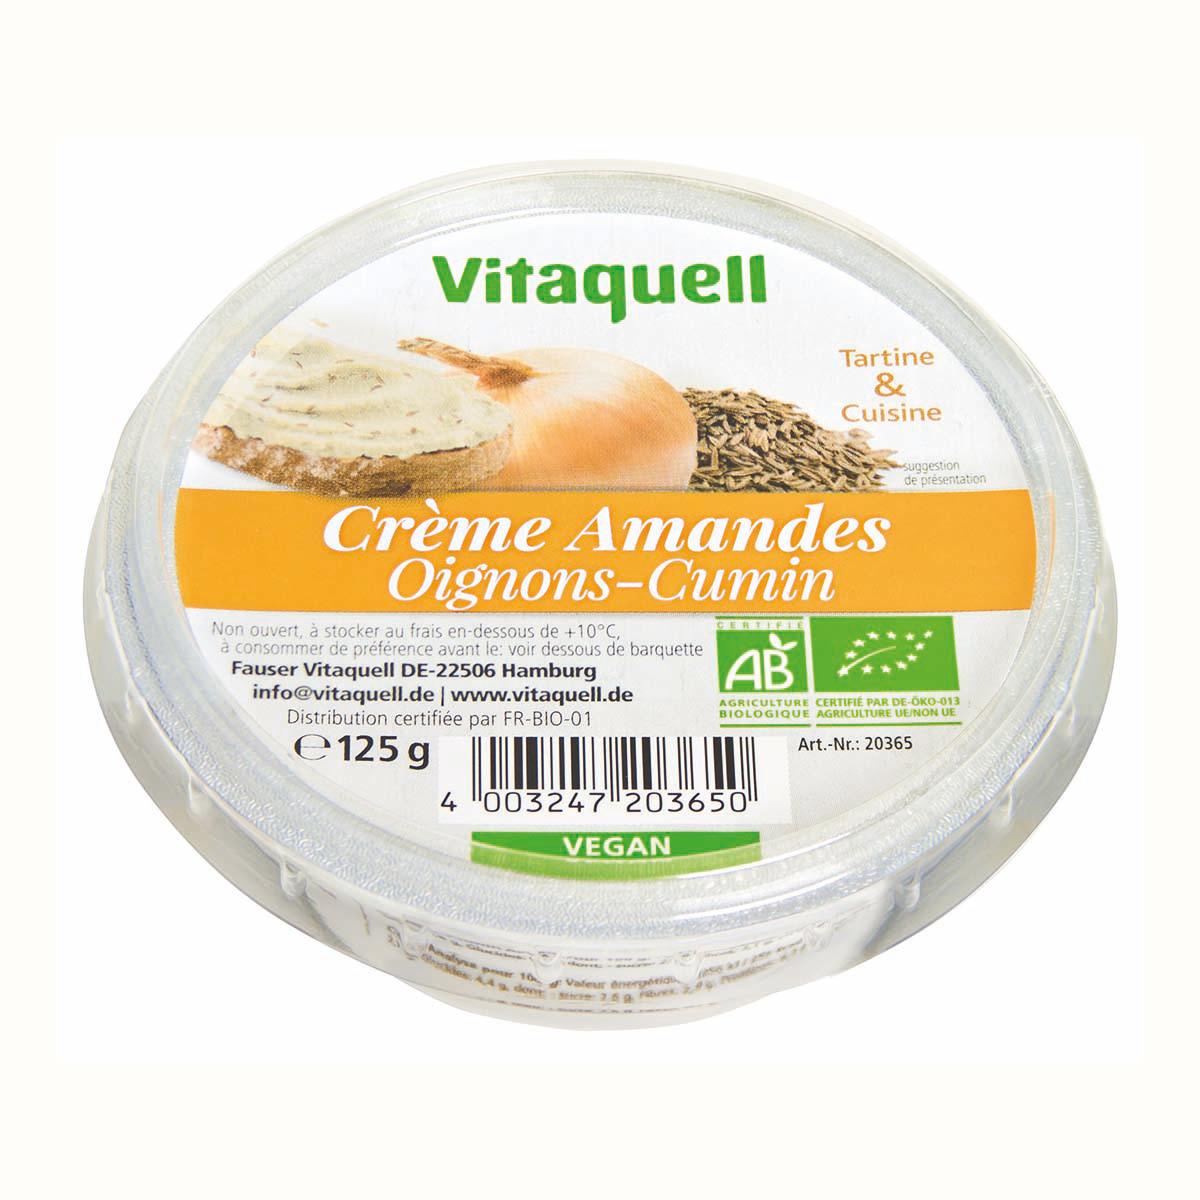 Crème Amandes Oignon-Cumin